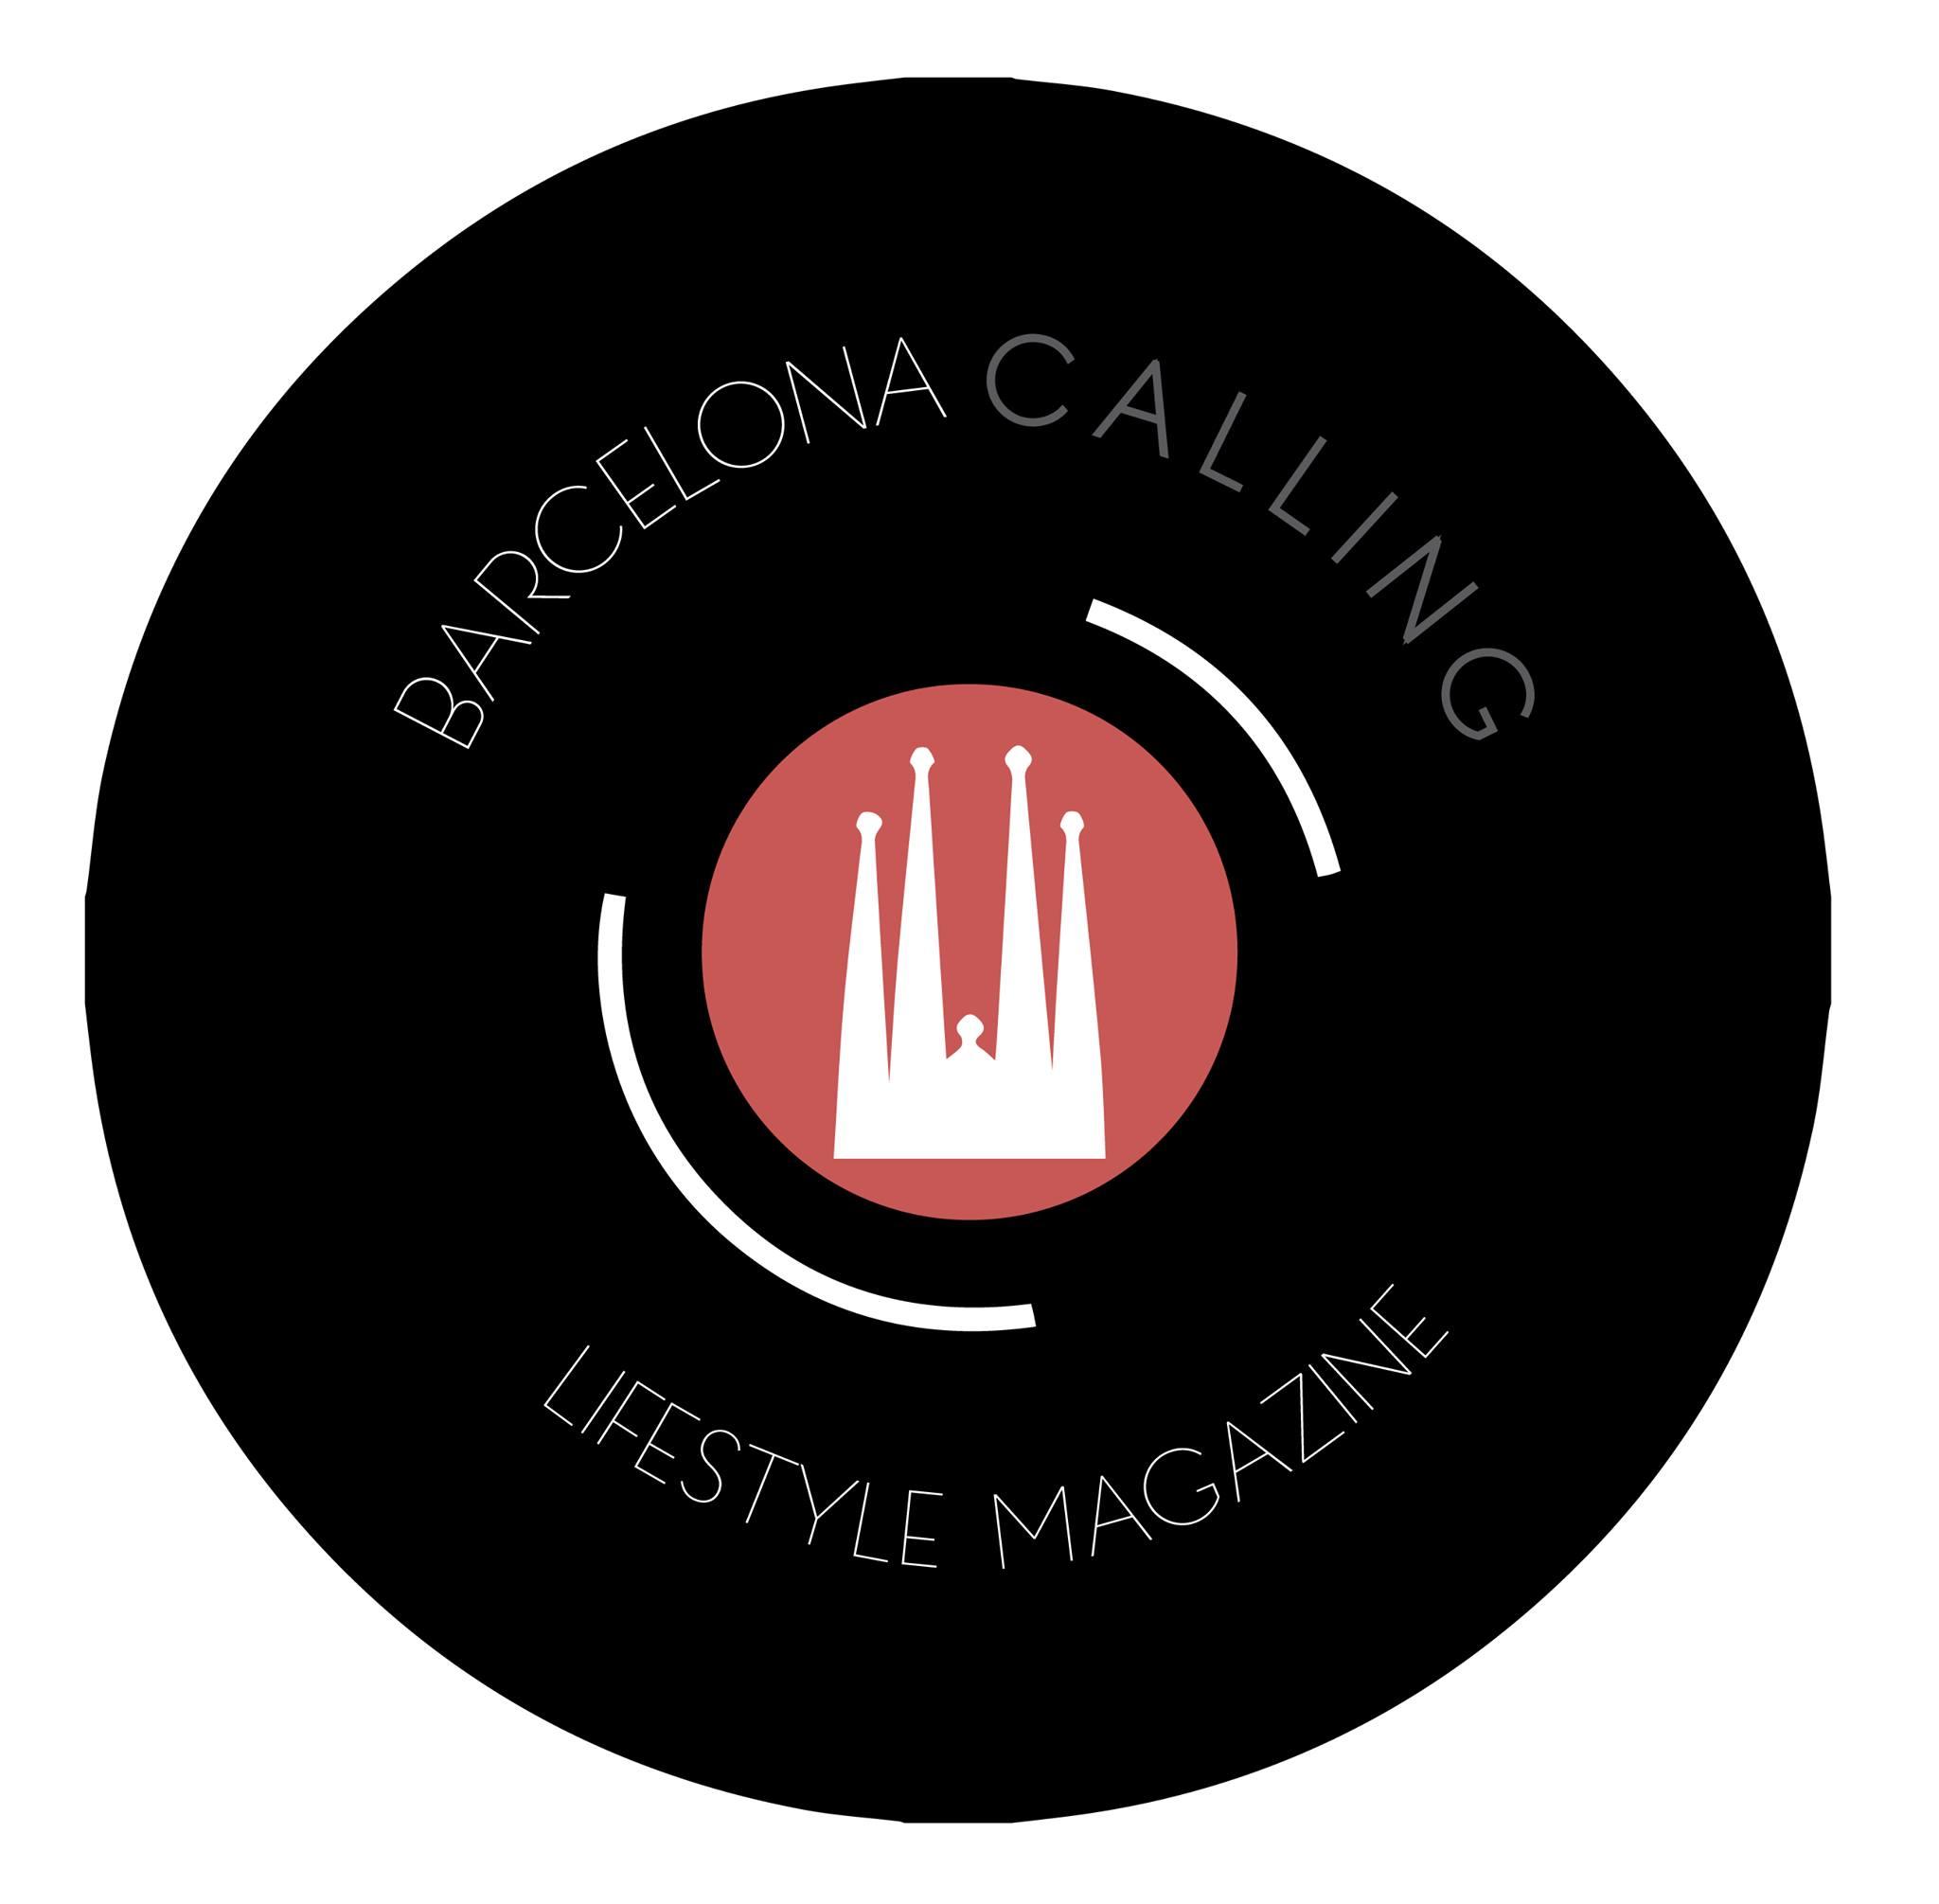 Thumbnail for Barcelona Calling